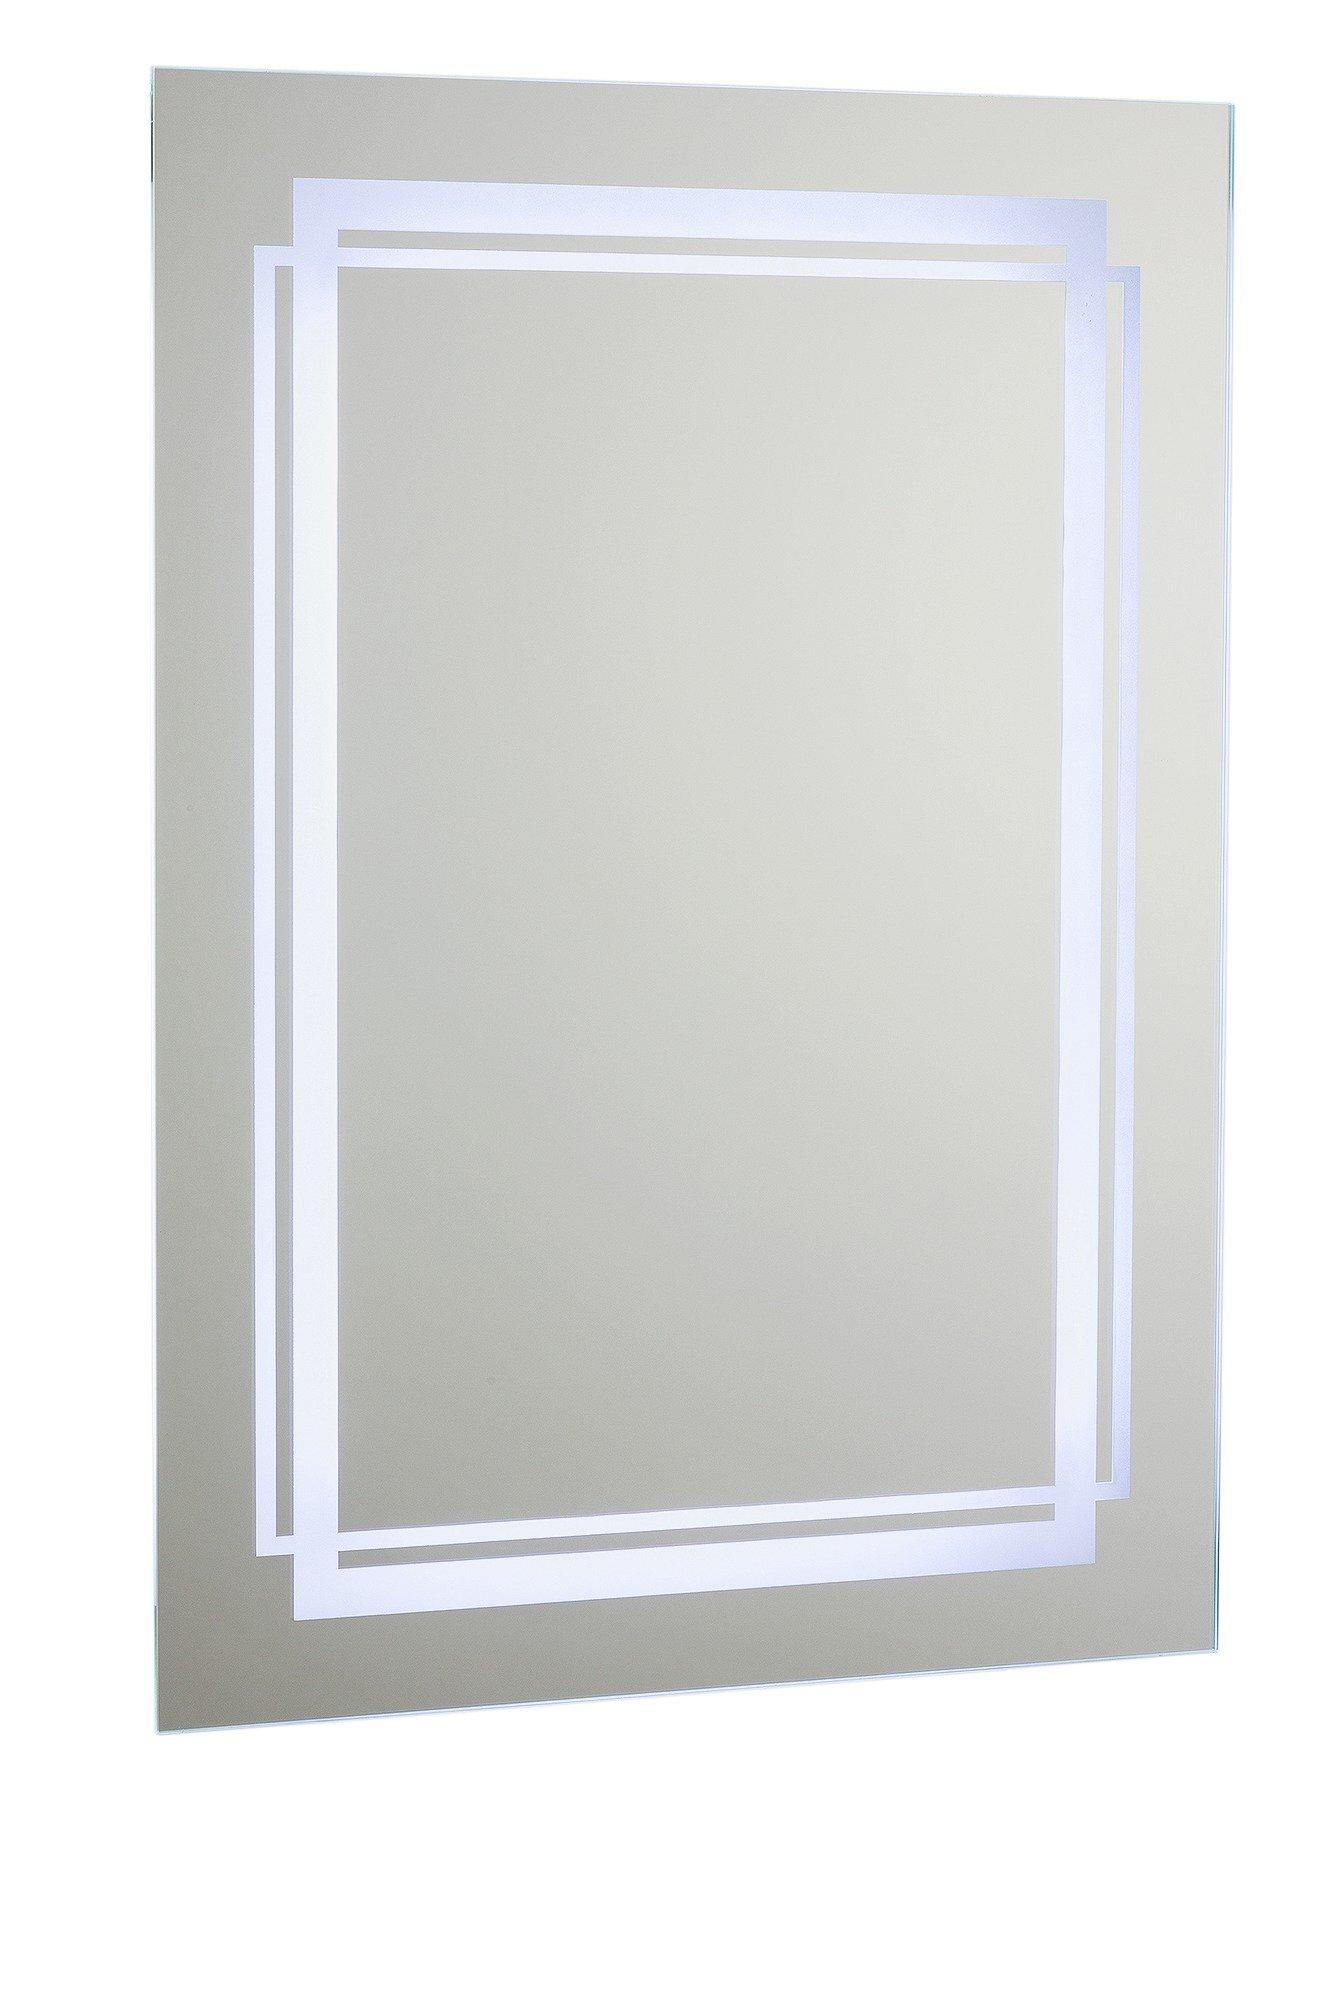 Argos Home Moda LED Bathroom Mirror with Shaver Point